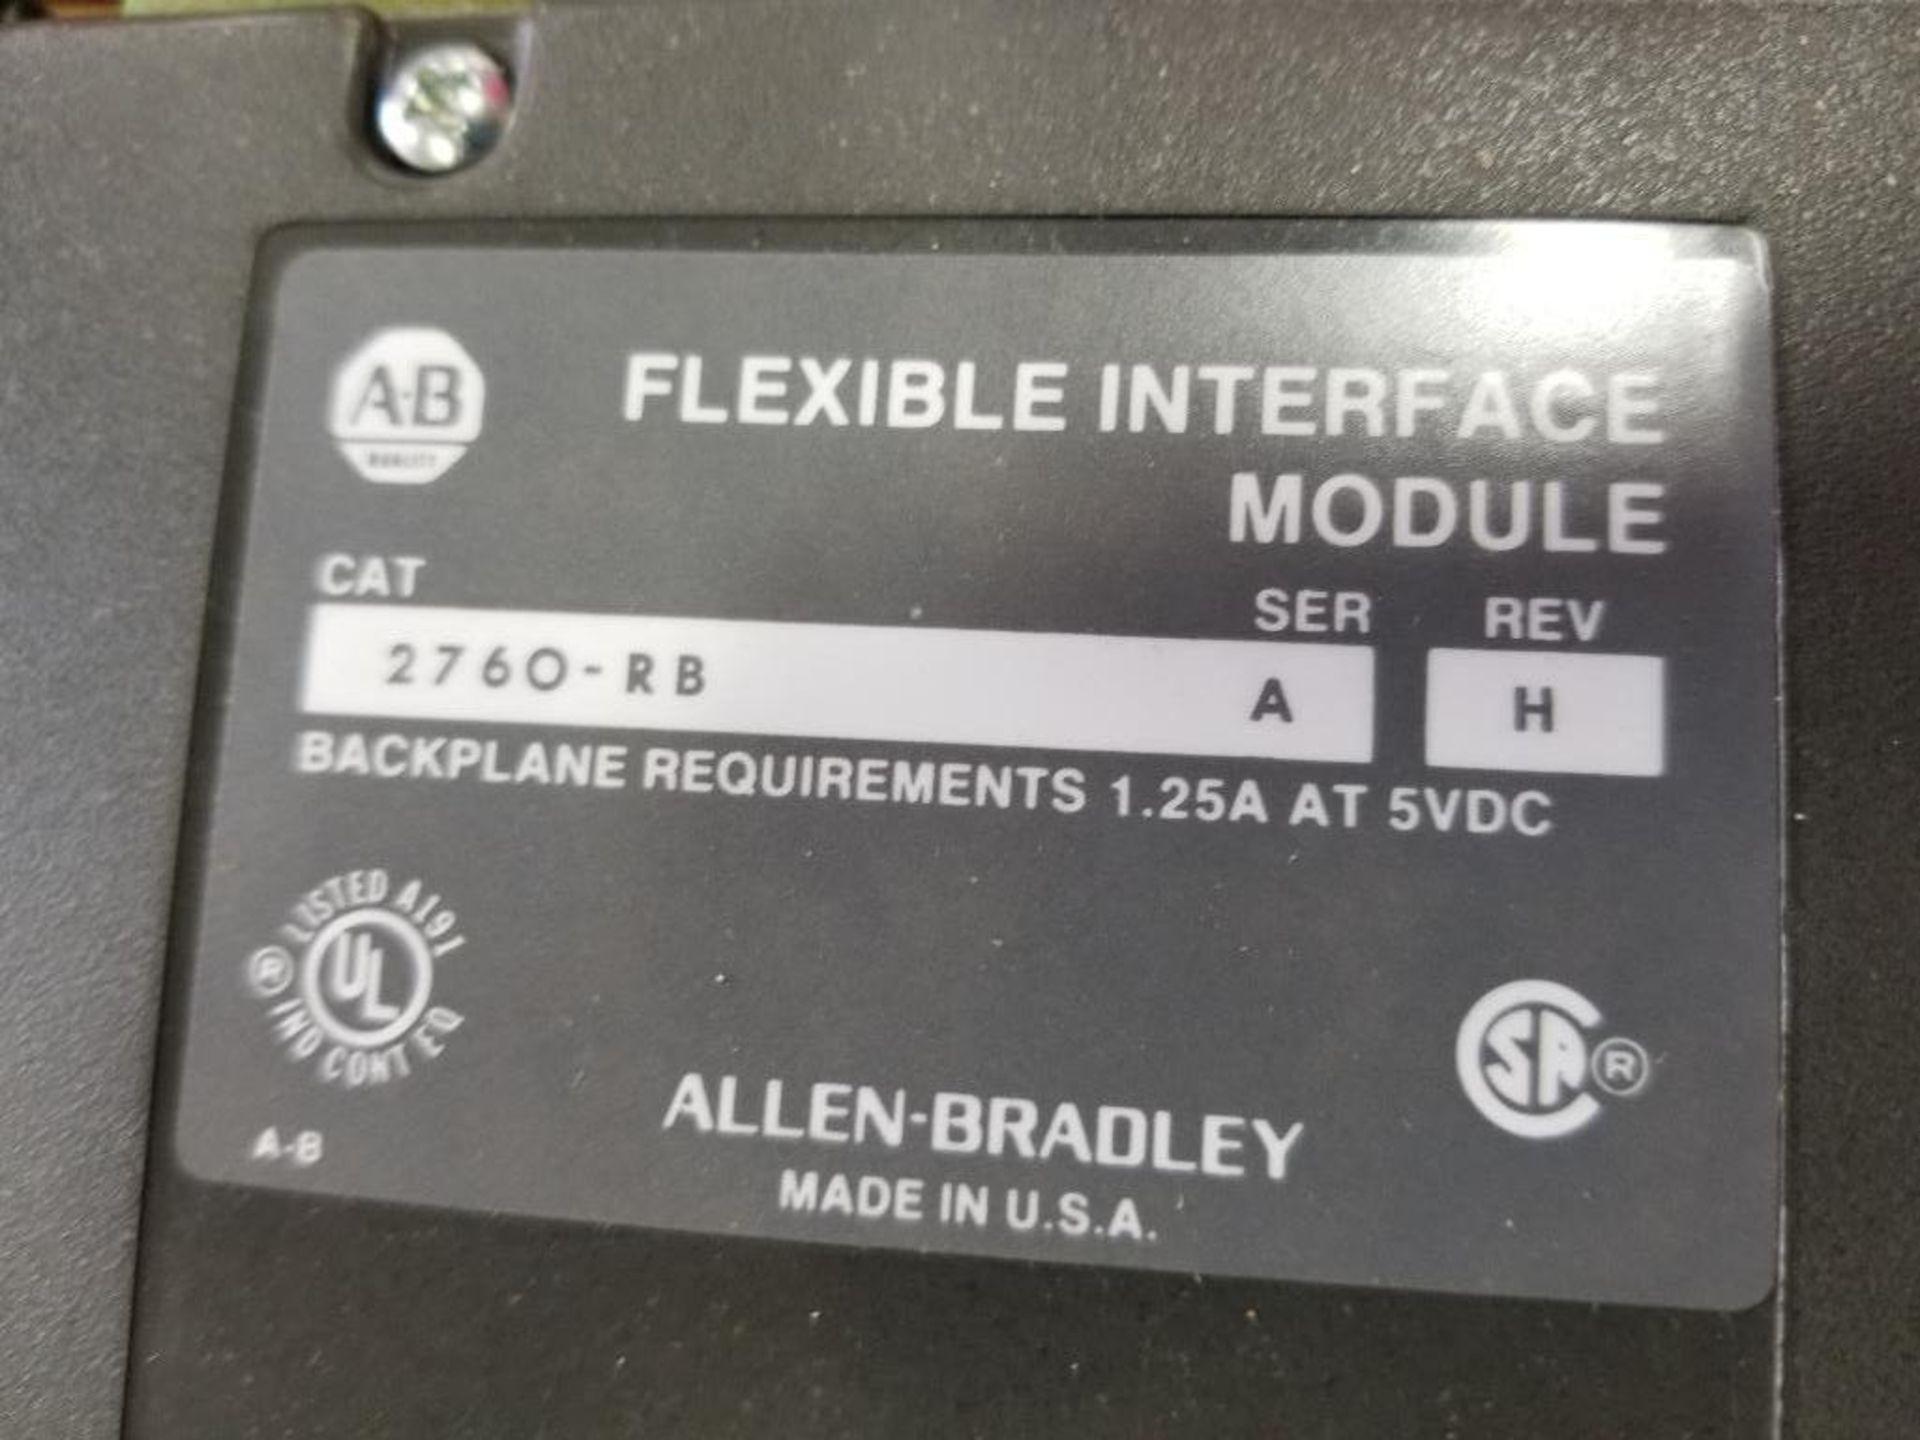 Allen Bradley flexible interface module. Catalog 2760-RB. New in box. - Image 3 of 5